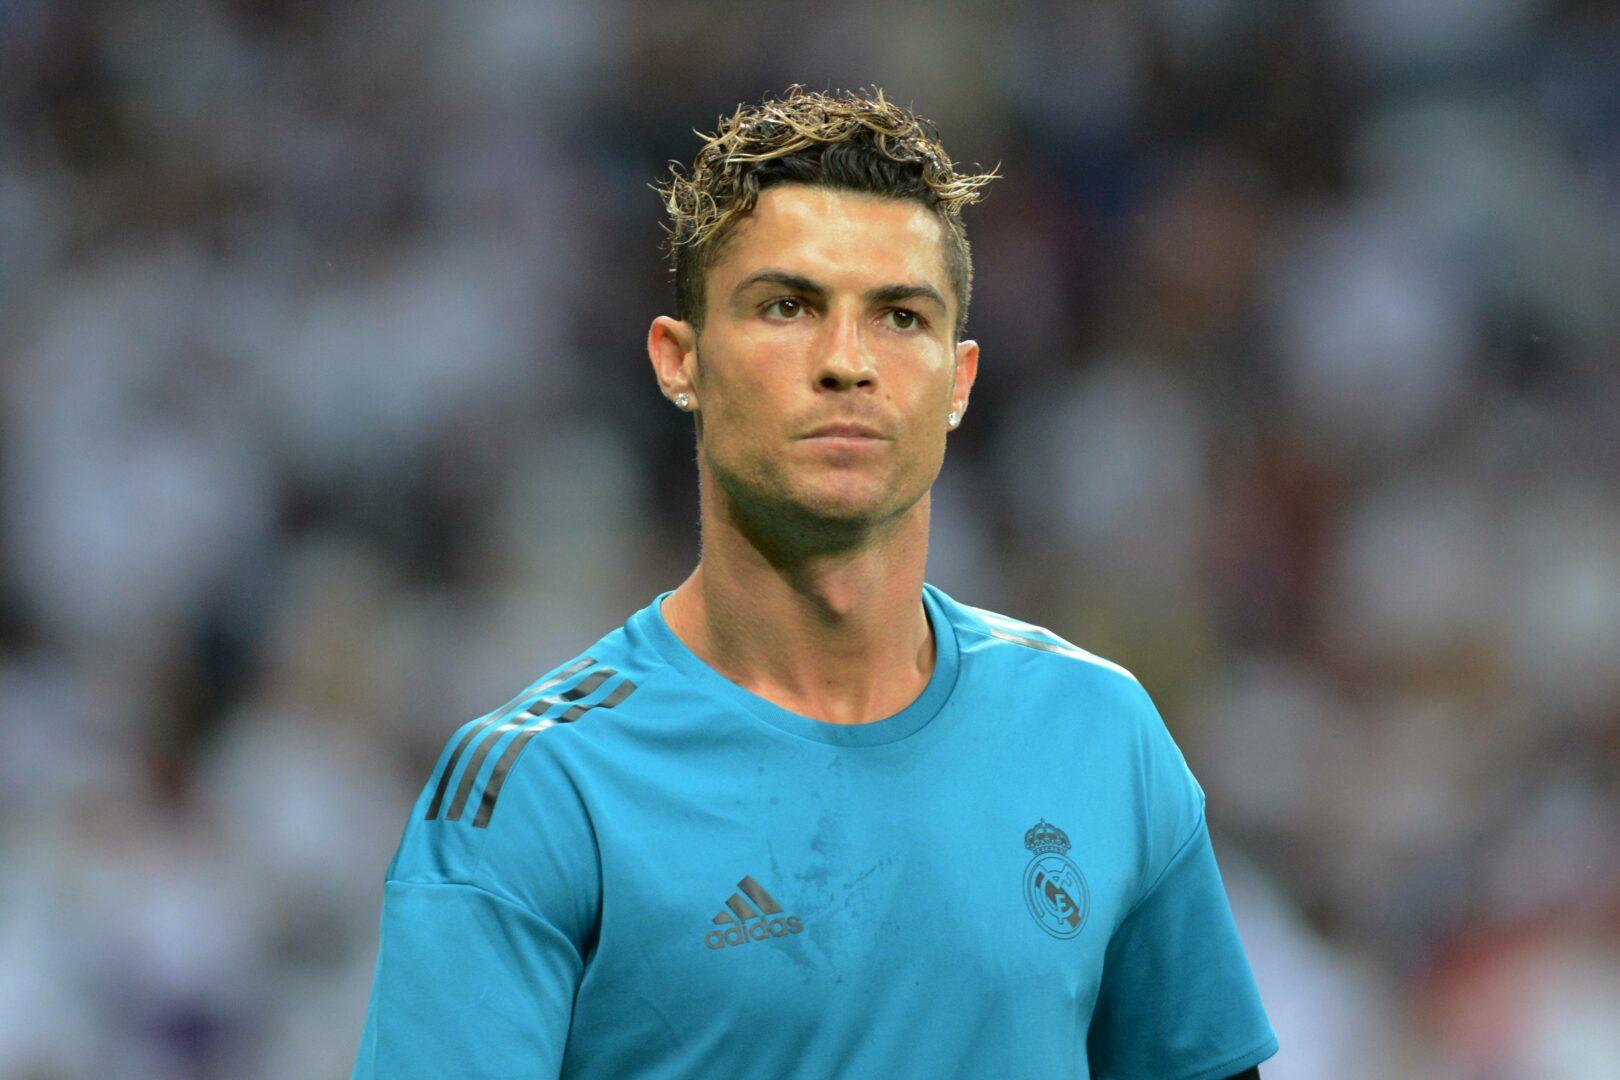 Cristiano Ronaldo (Real Madrid) beim Aufwärmen